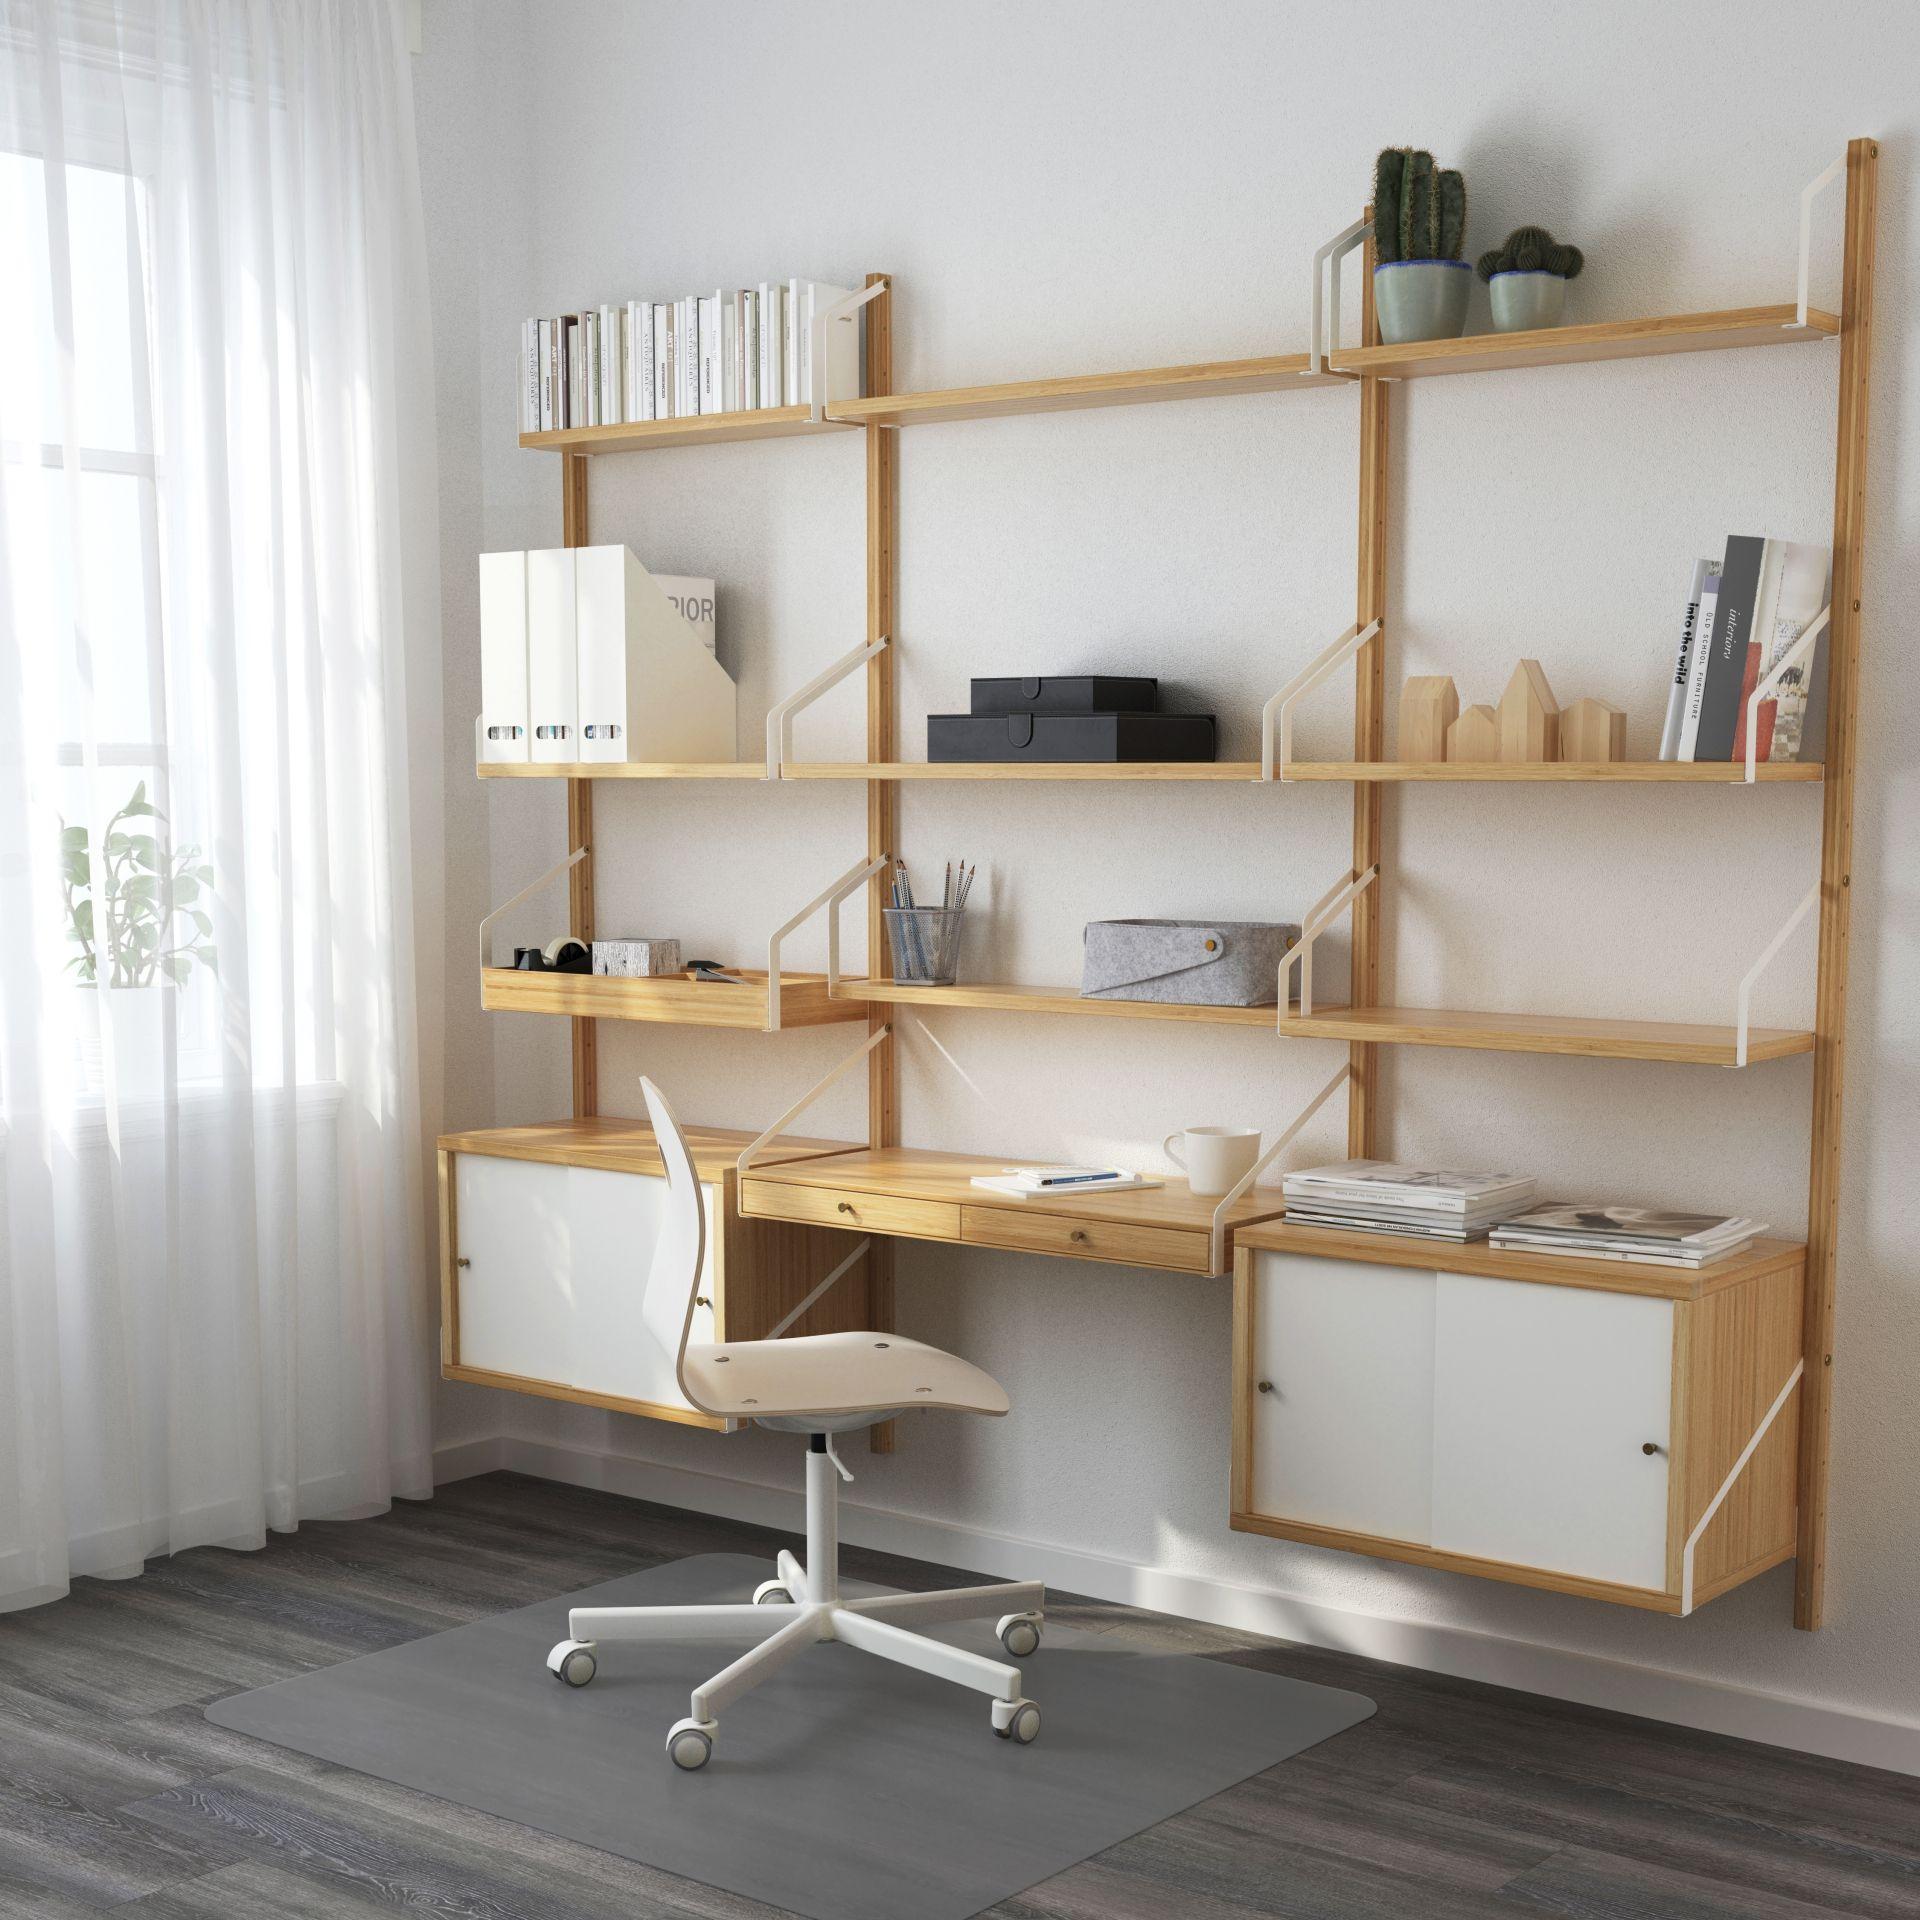 Svalnäs Open Wandkastcombinatie Ikea Ikeanl Ikeanederland